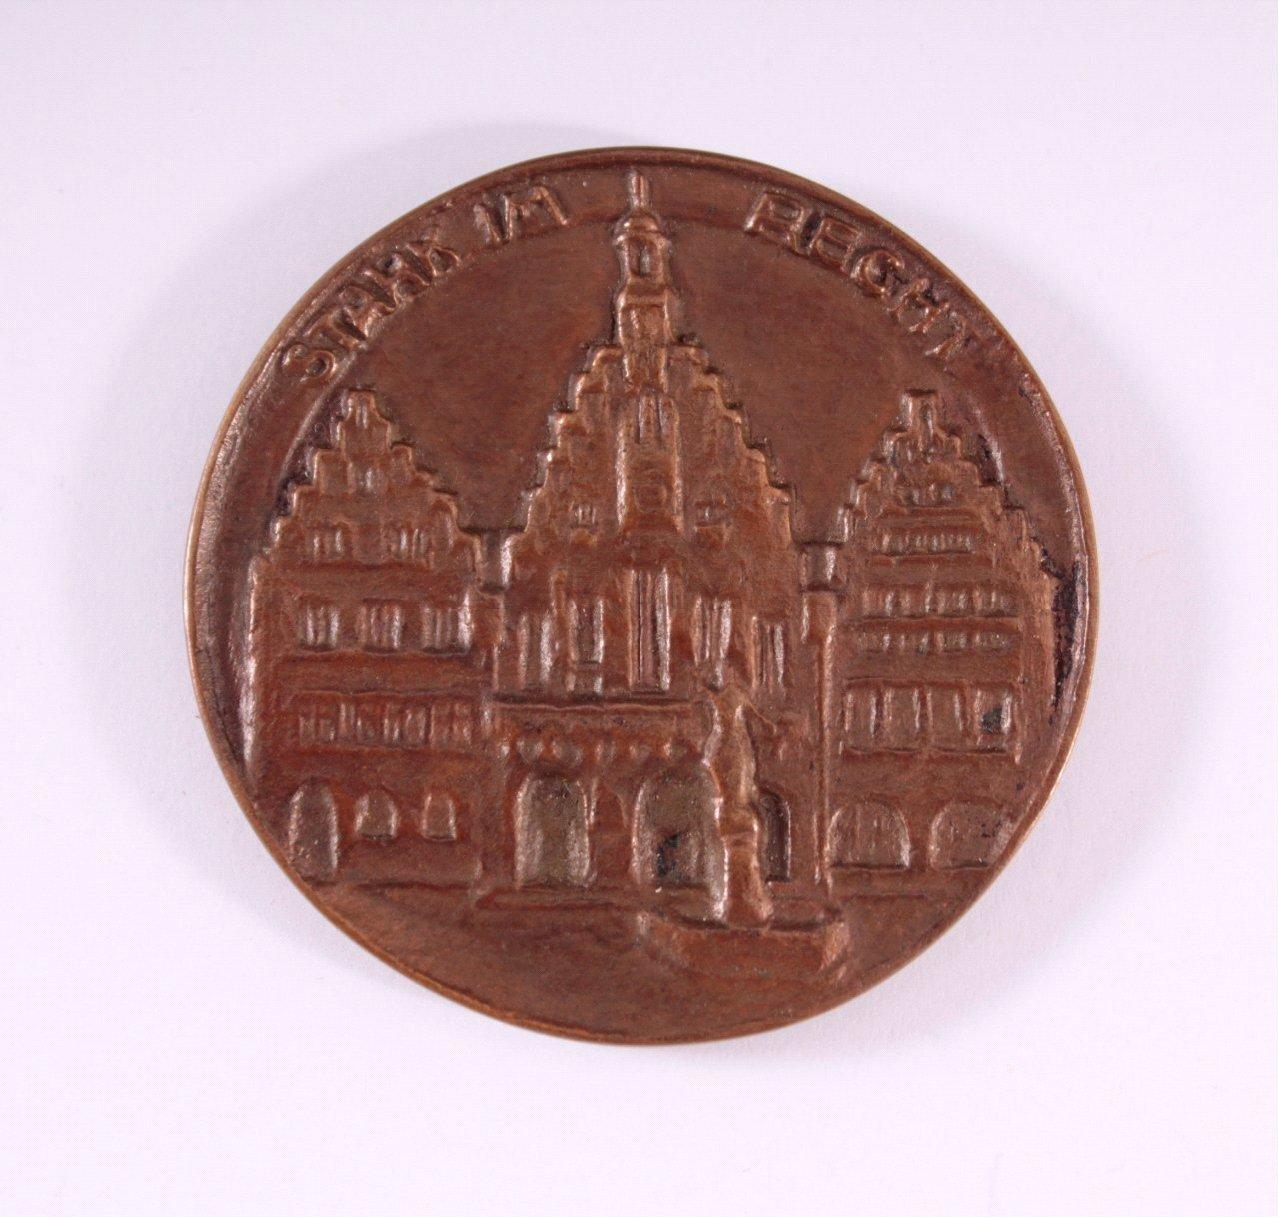 Bronze Medaille, Stark im Recht, Frankfurt 1934